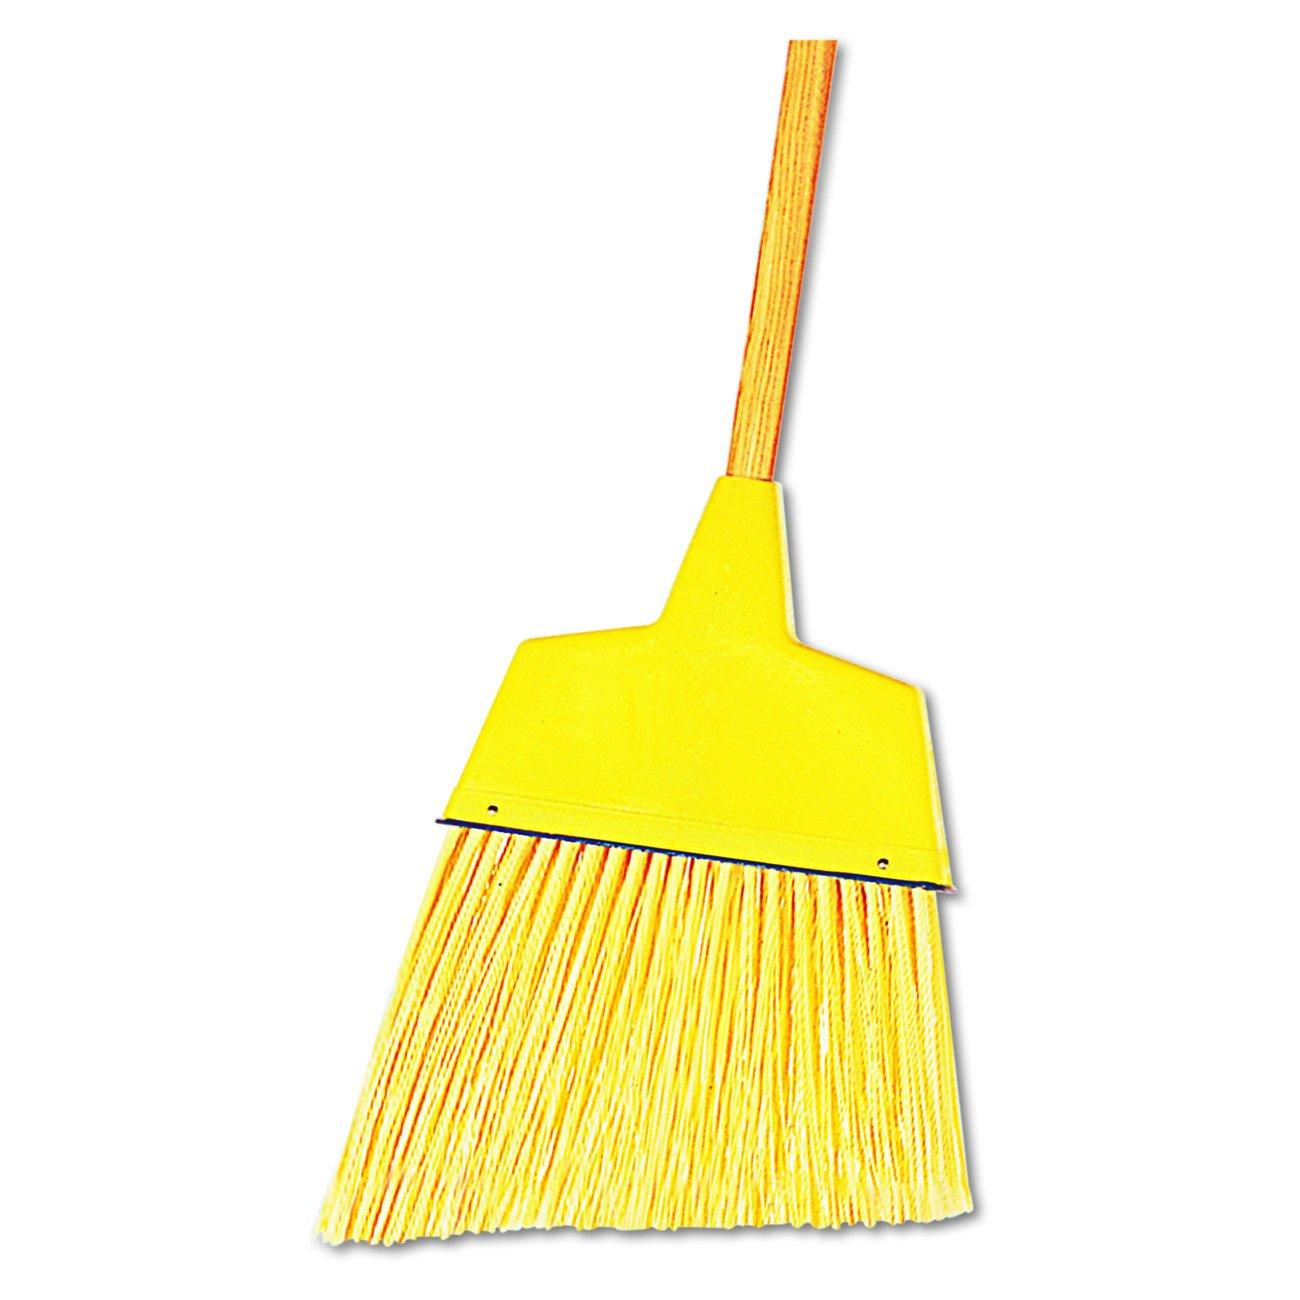 Boardwalk 932A Angler Broom, Plastic Bristles, 42'' Wood Handle, Yellow (Pack of 12)